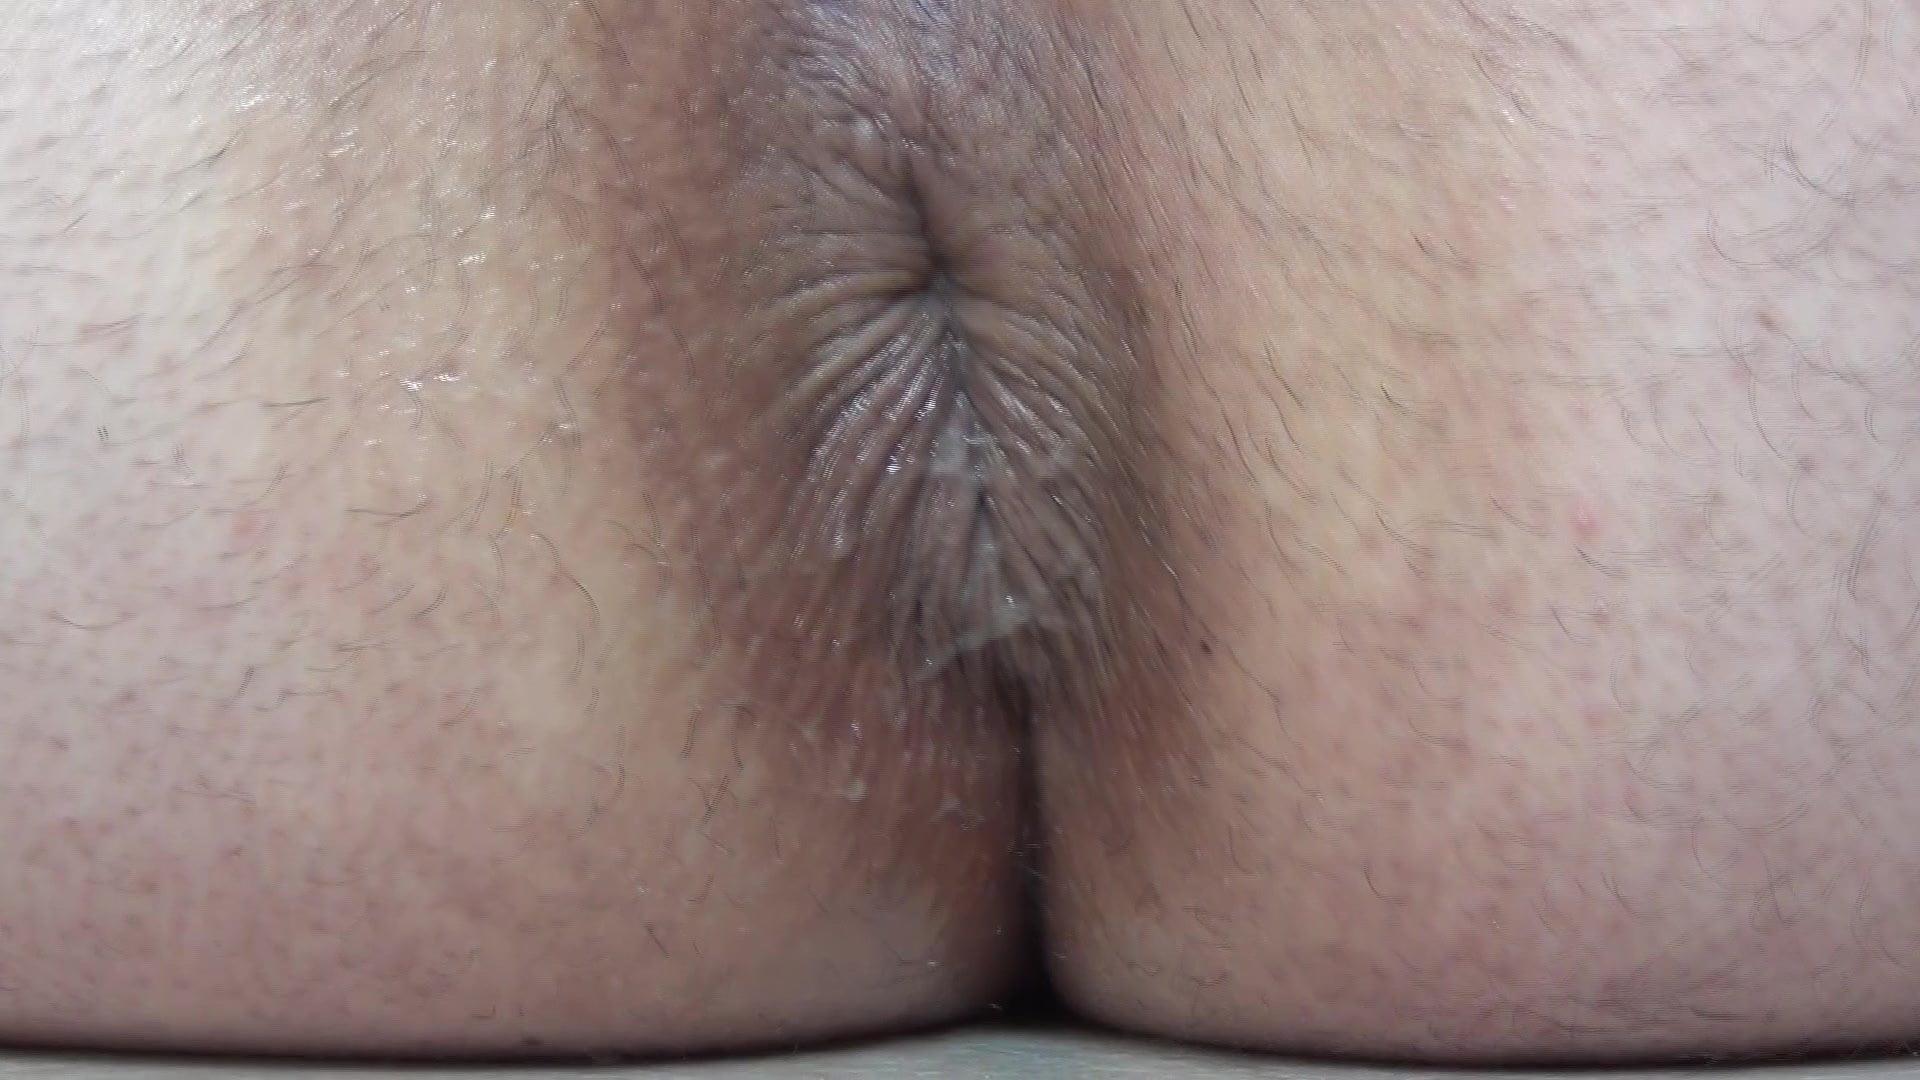 Lesbian Clit Licking Up Close